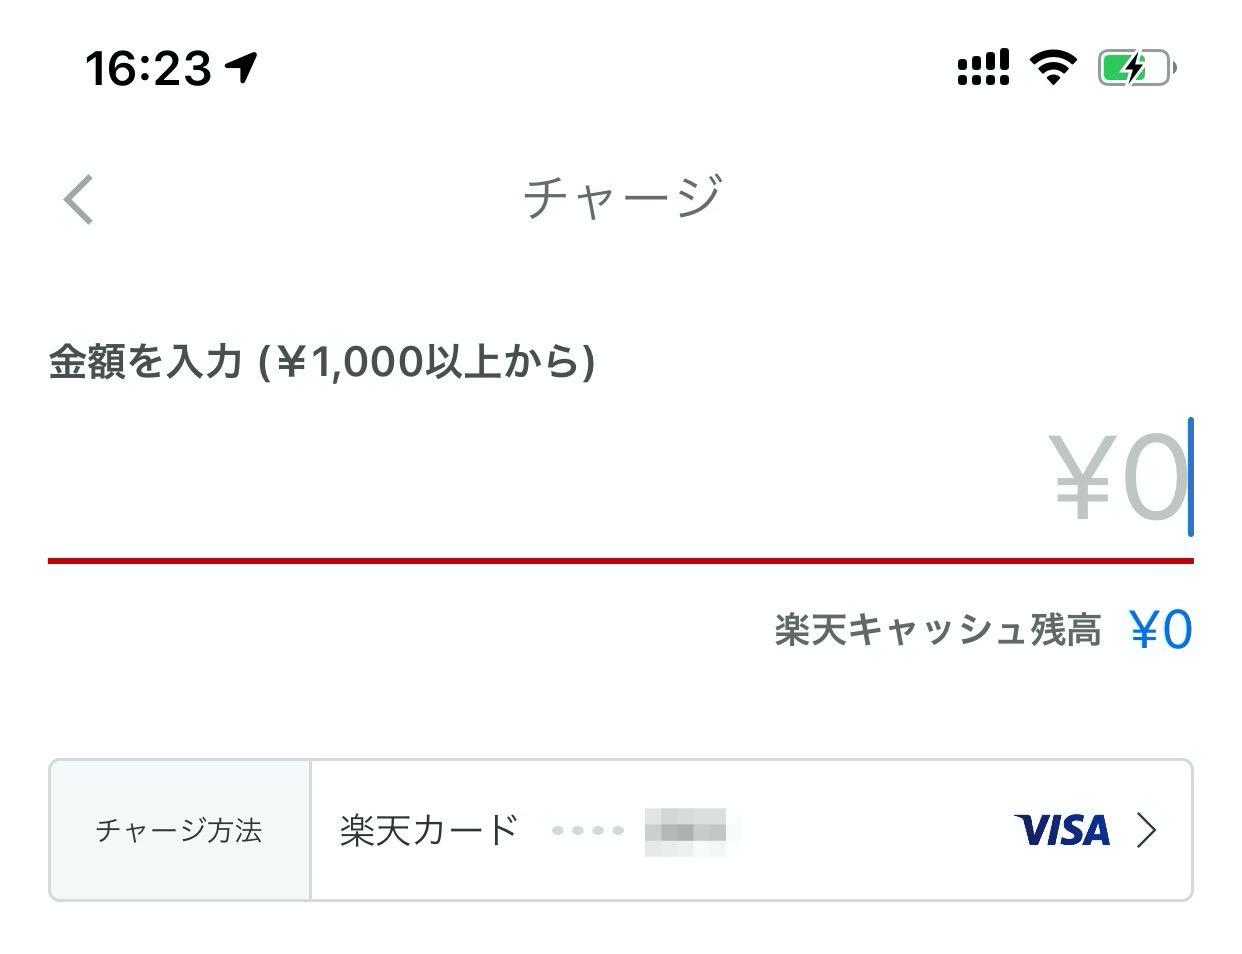 【Kyash】楽天ペイのチャージ用クレジットカードには登録不可→理由は3Dセキュア非対応だから